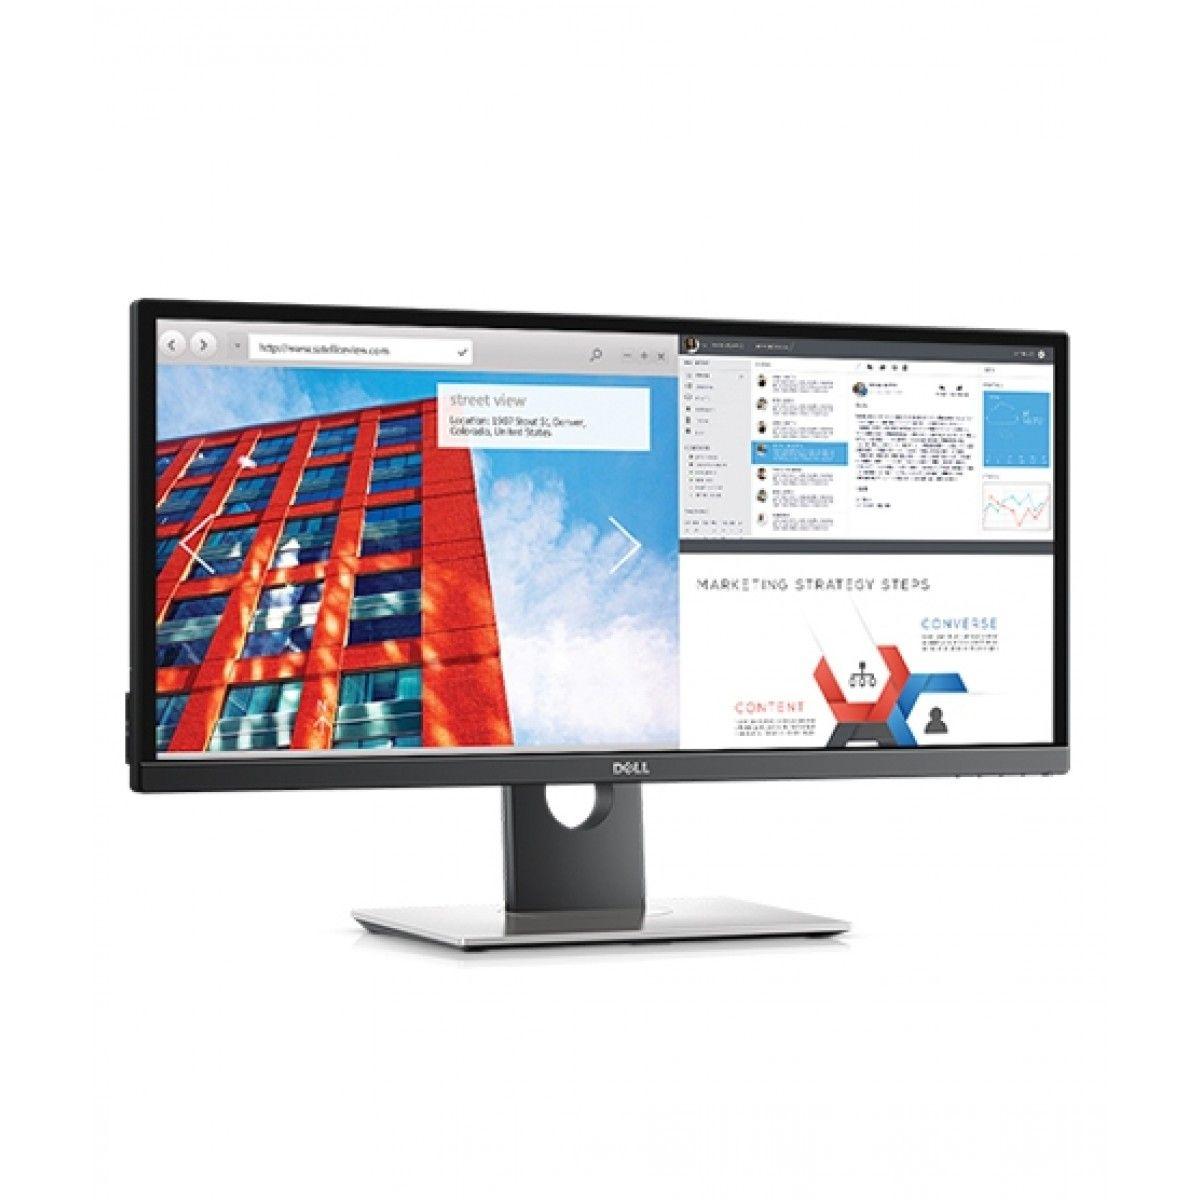 "Dell U2917W 28.8"" Ultrasharp LED Monitor"